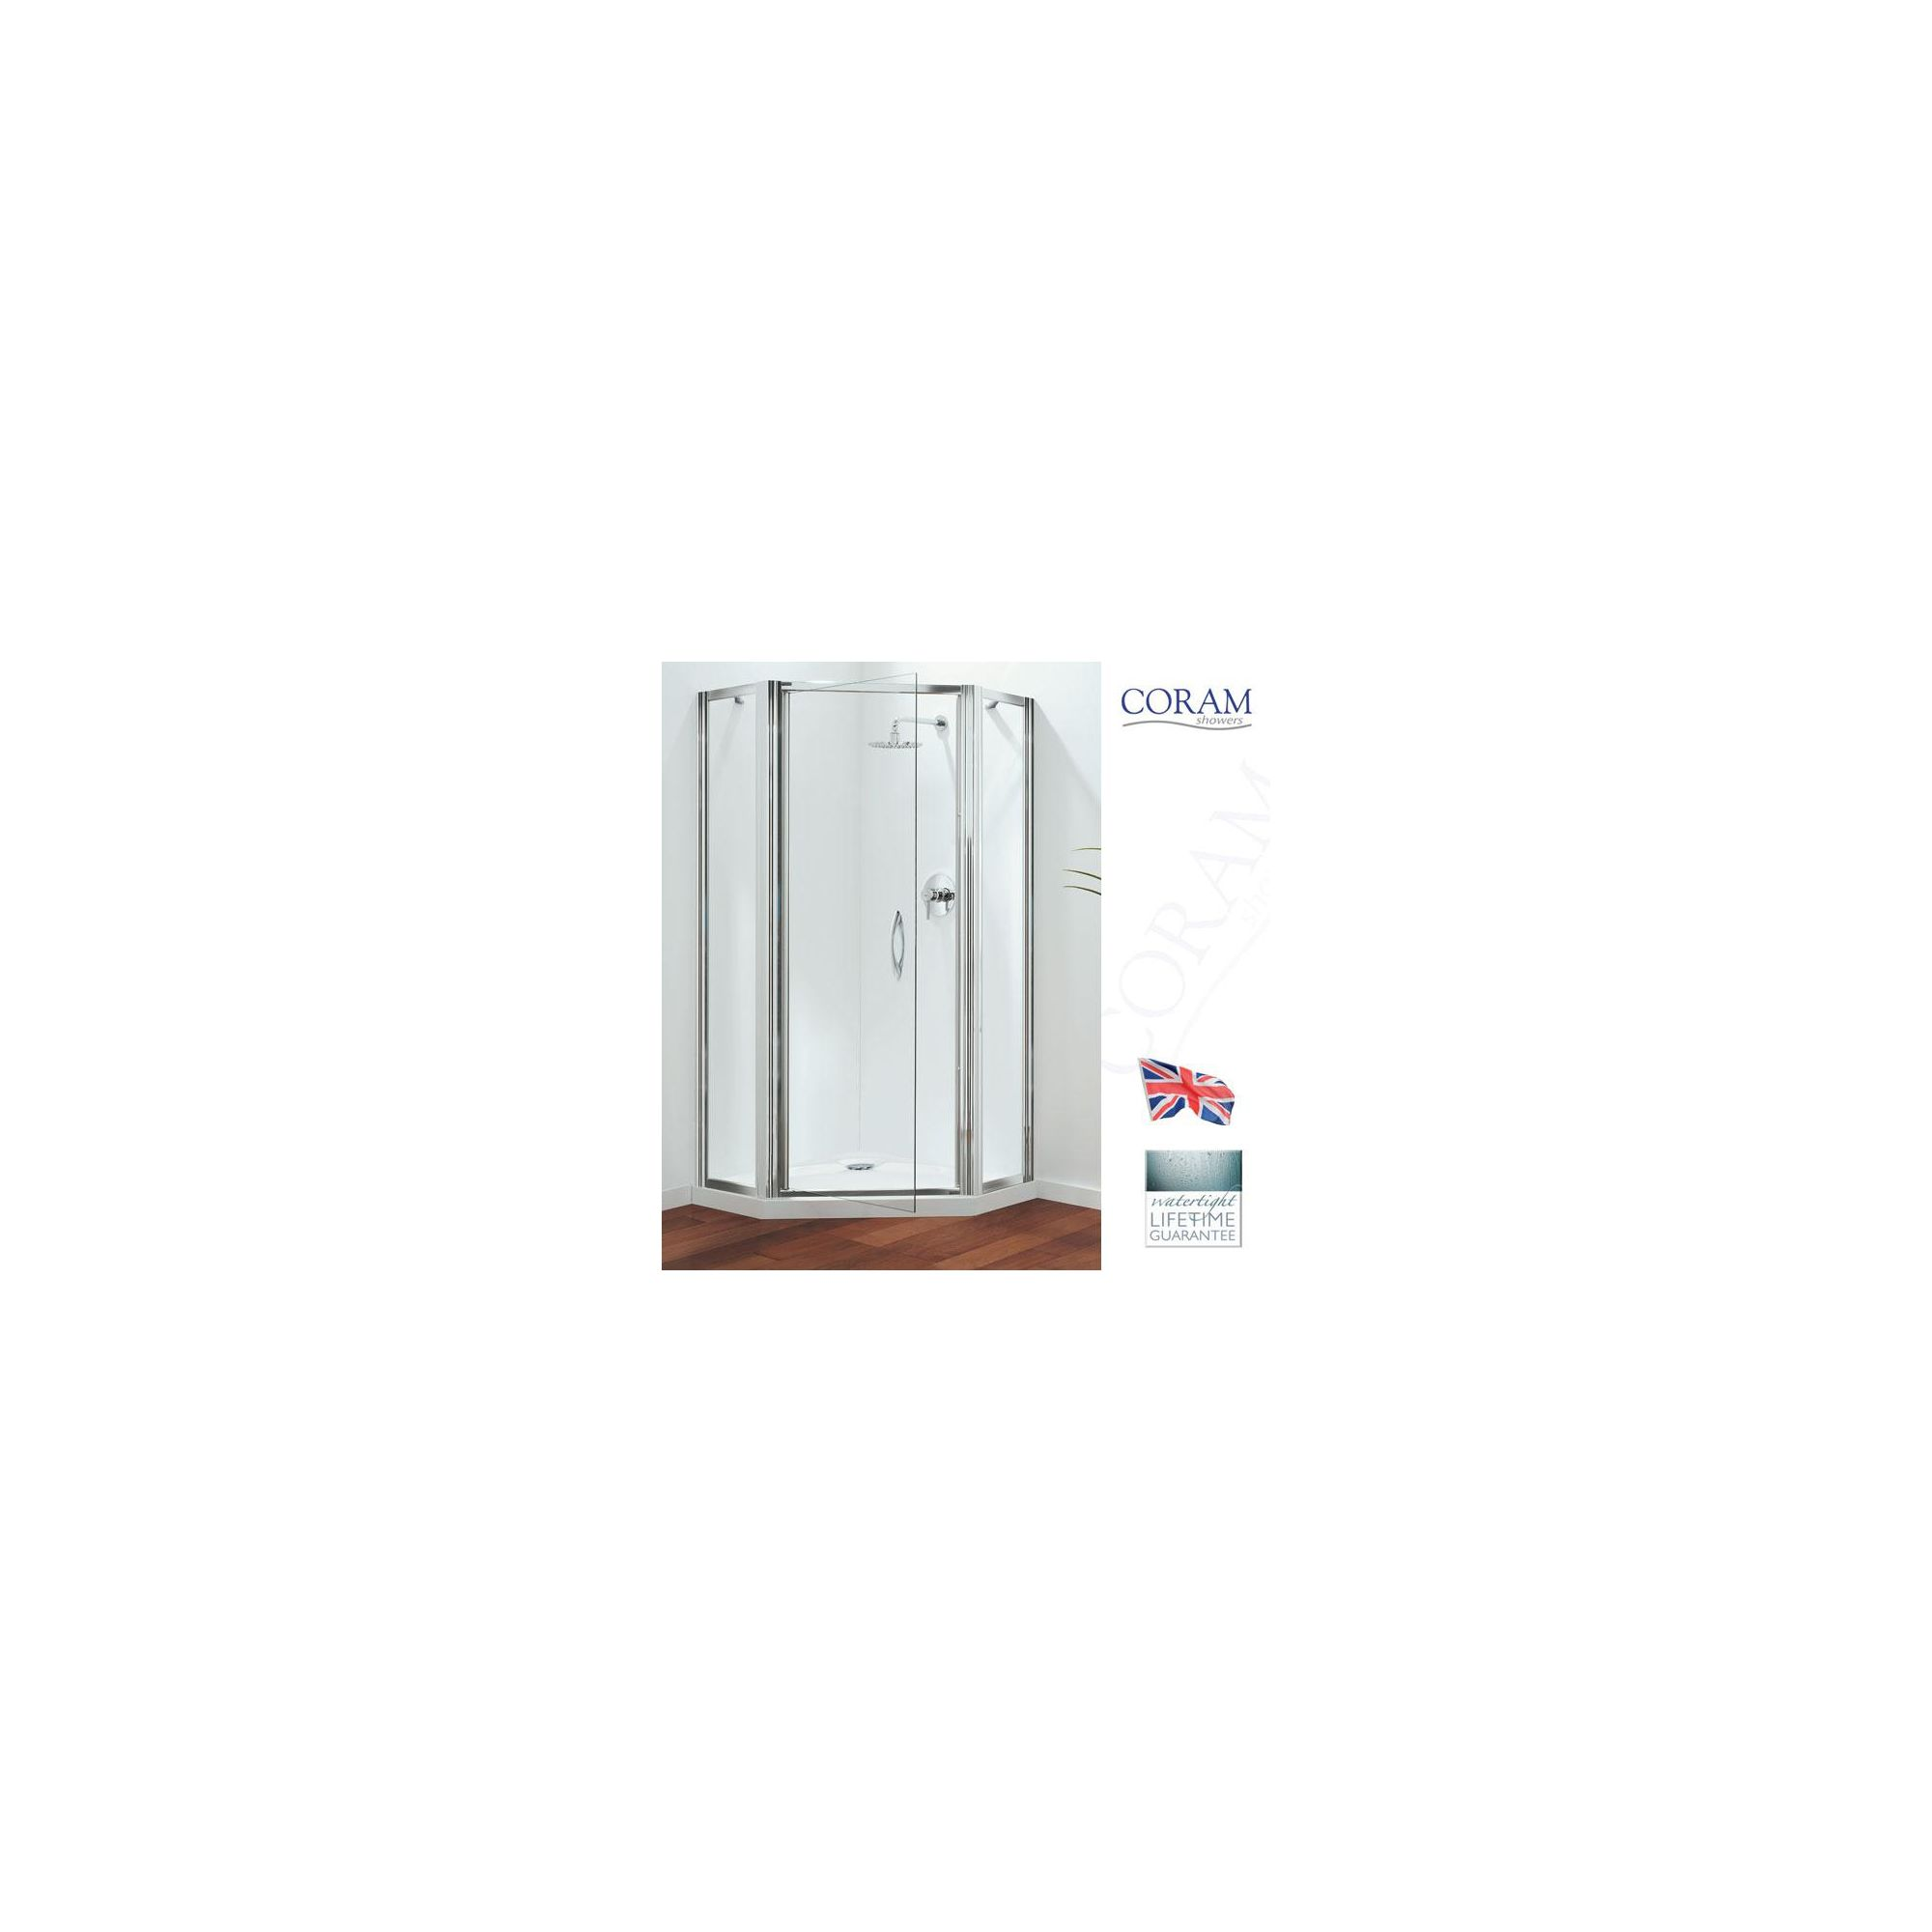 Coram Premier Pentagonal Frameless Swing Door Shower Enclosure, 900mm x 900mm, Low Profile Tray, 6mm Glass at Tesco Direct